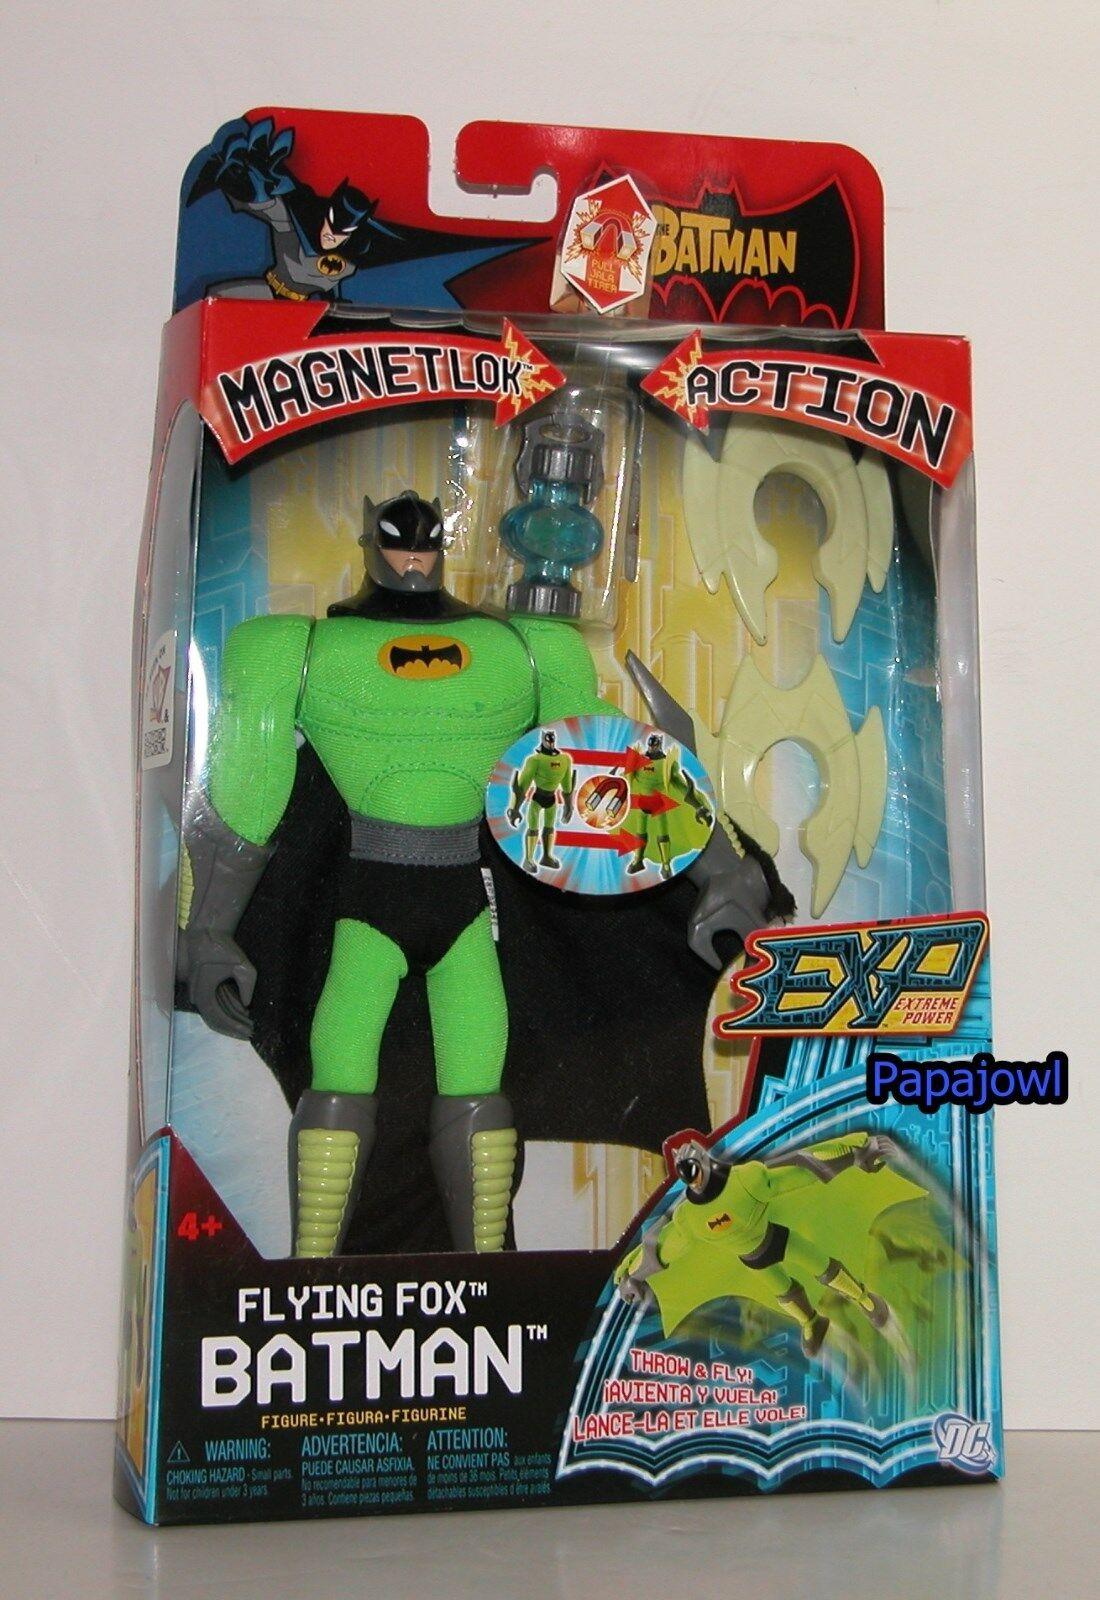 EXP Extreme Power Flying Fox Batman Magnet lok Action 8  Action Figure DC Mattel